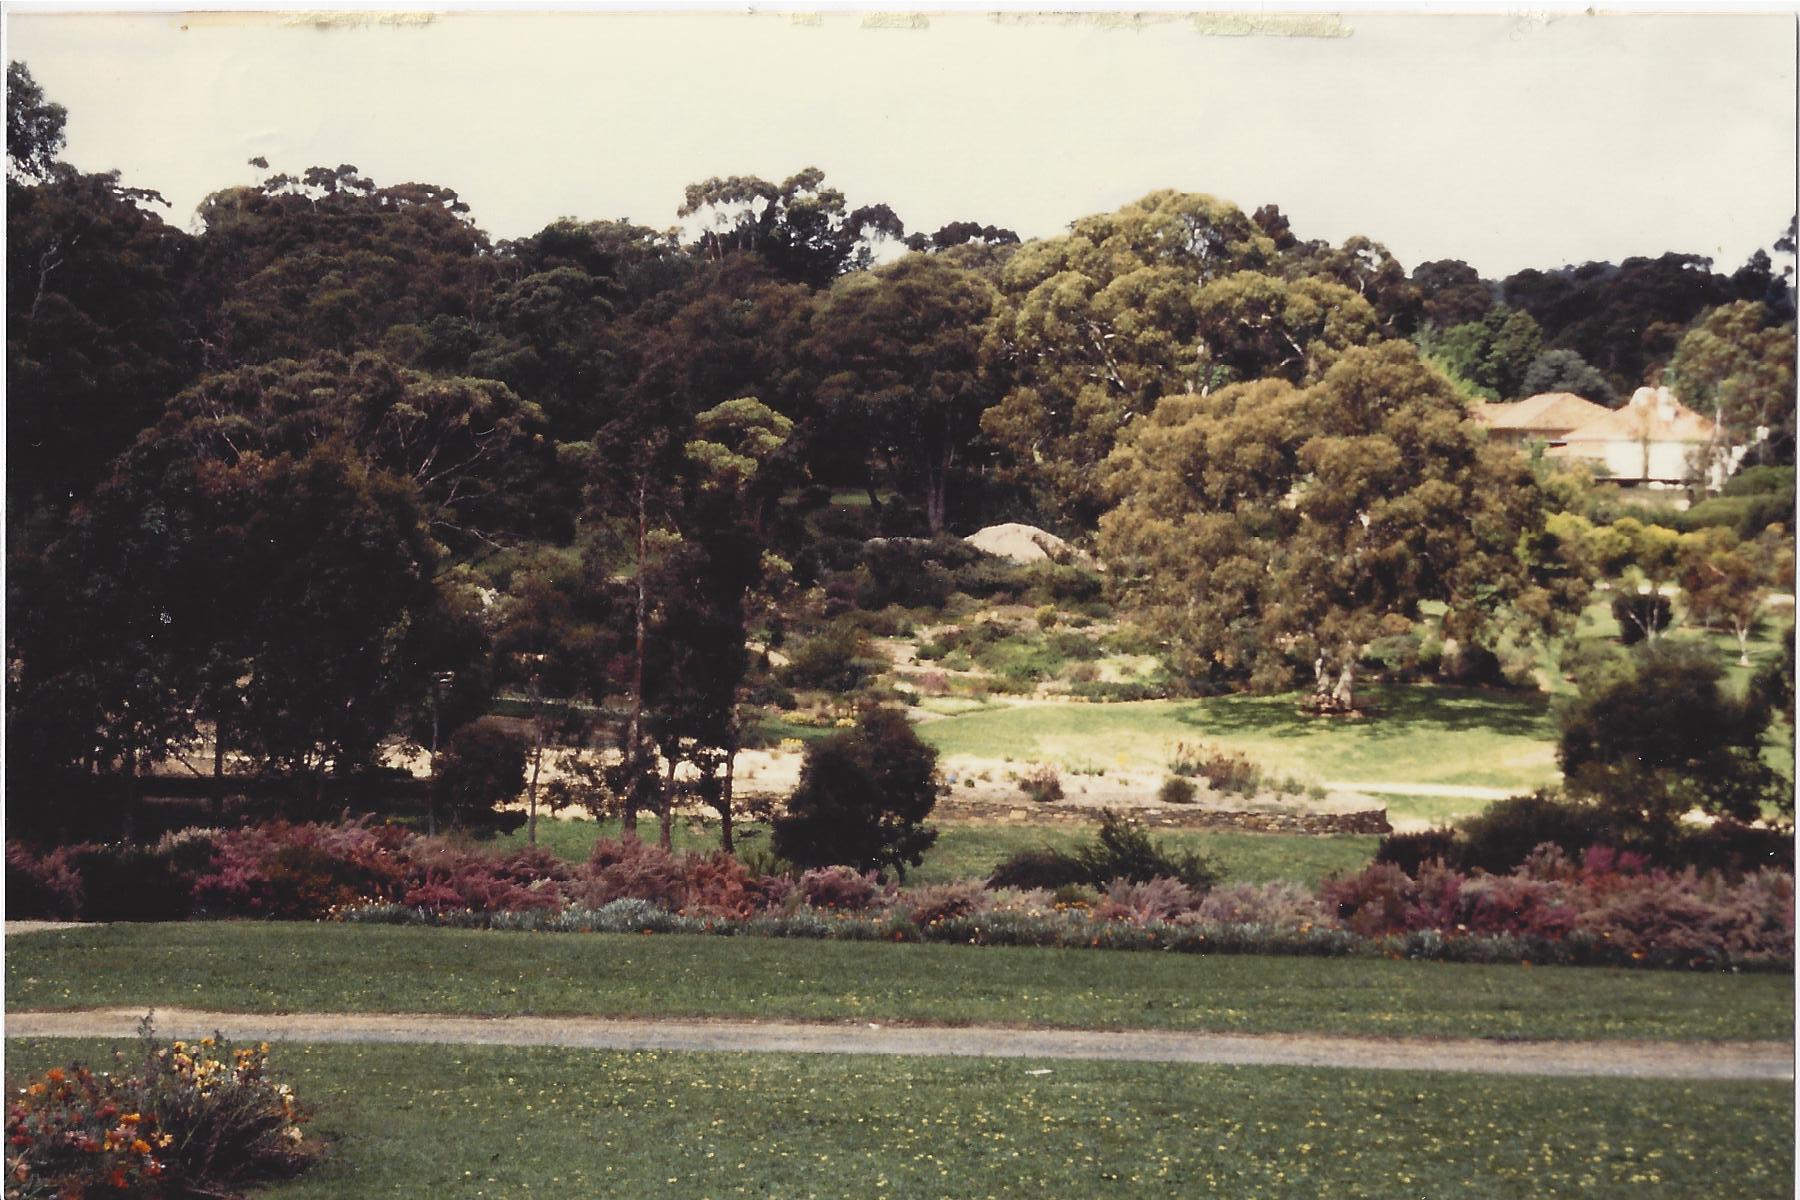 Image-4-S.W.-Australia-Adelaide-Botanic-Garden.-Tree-Heaths-1.jpg